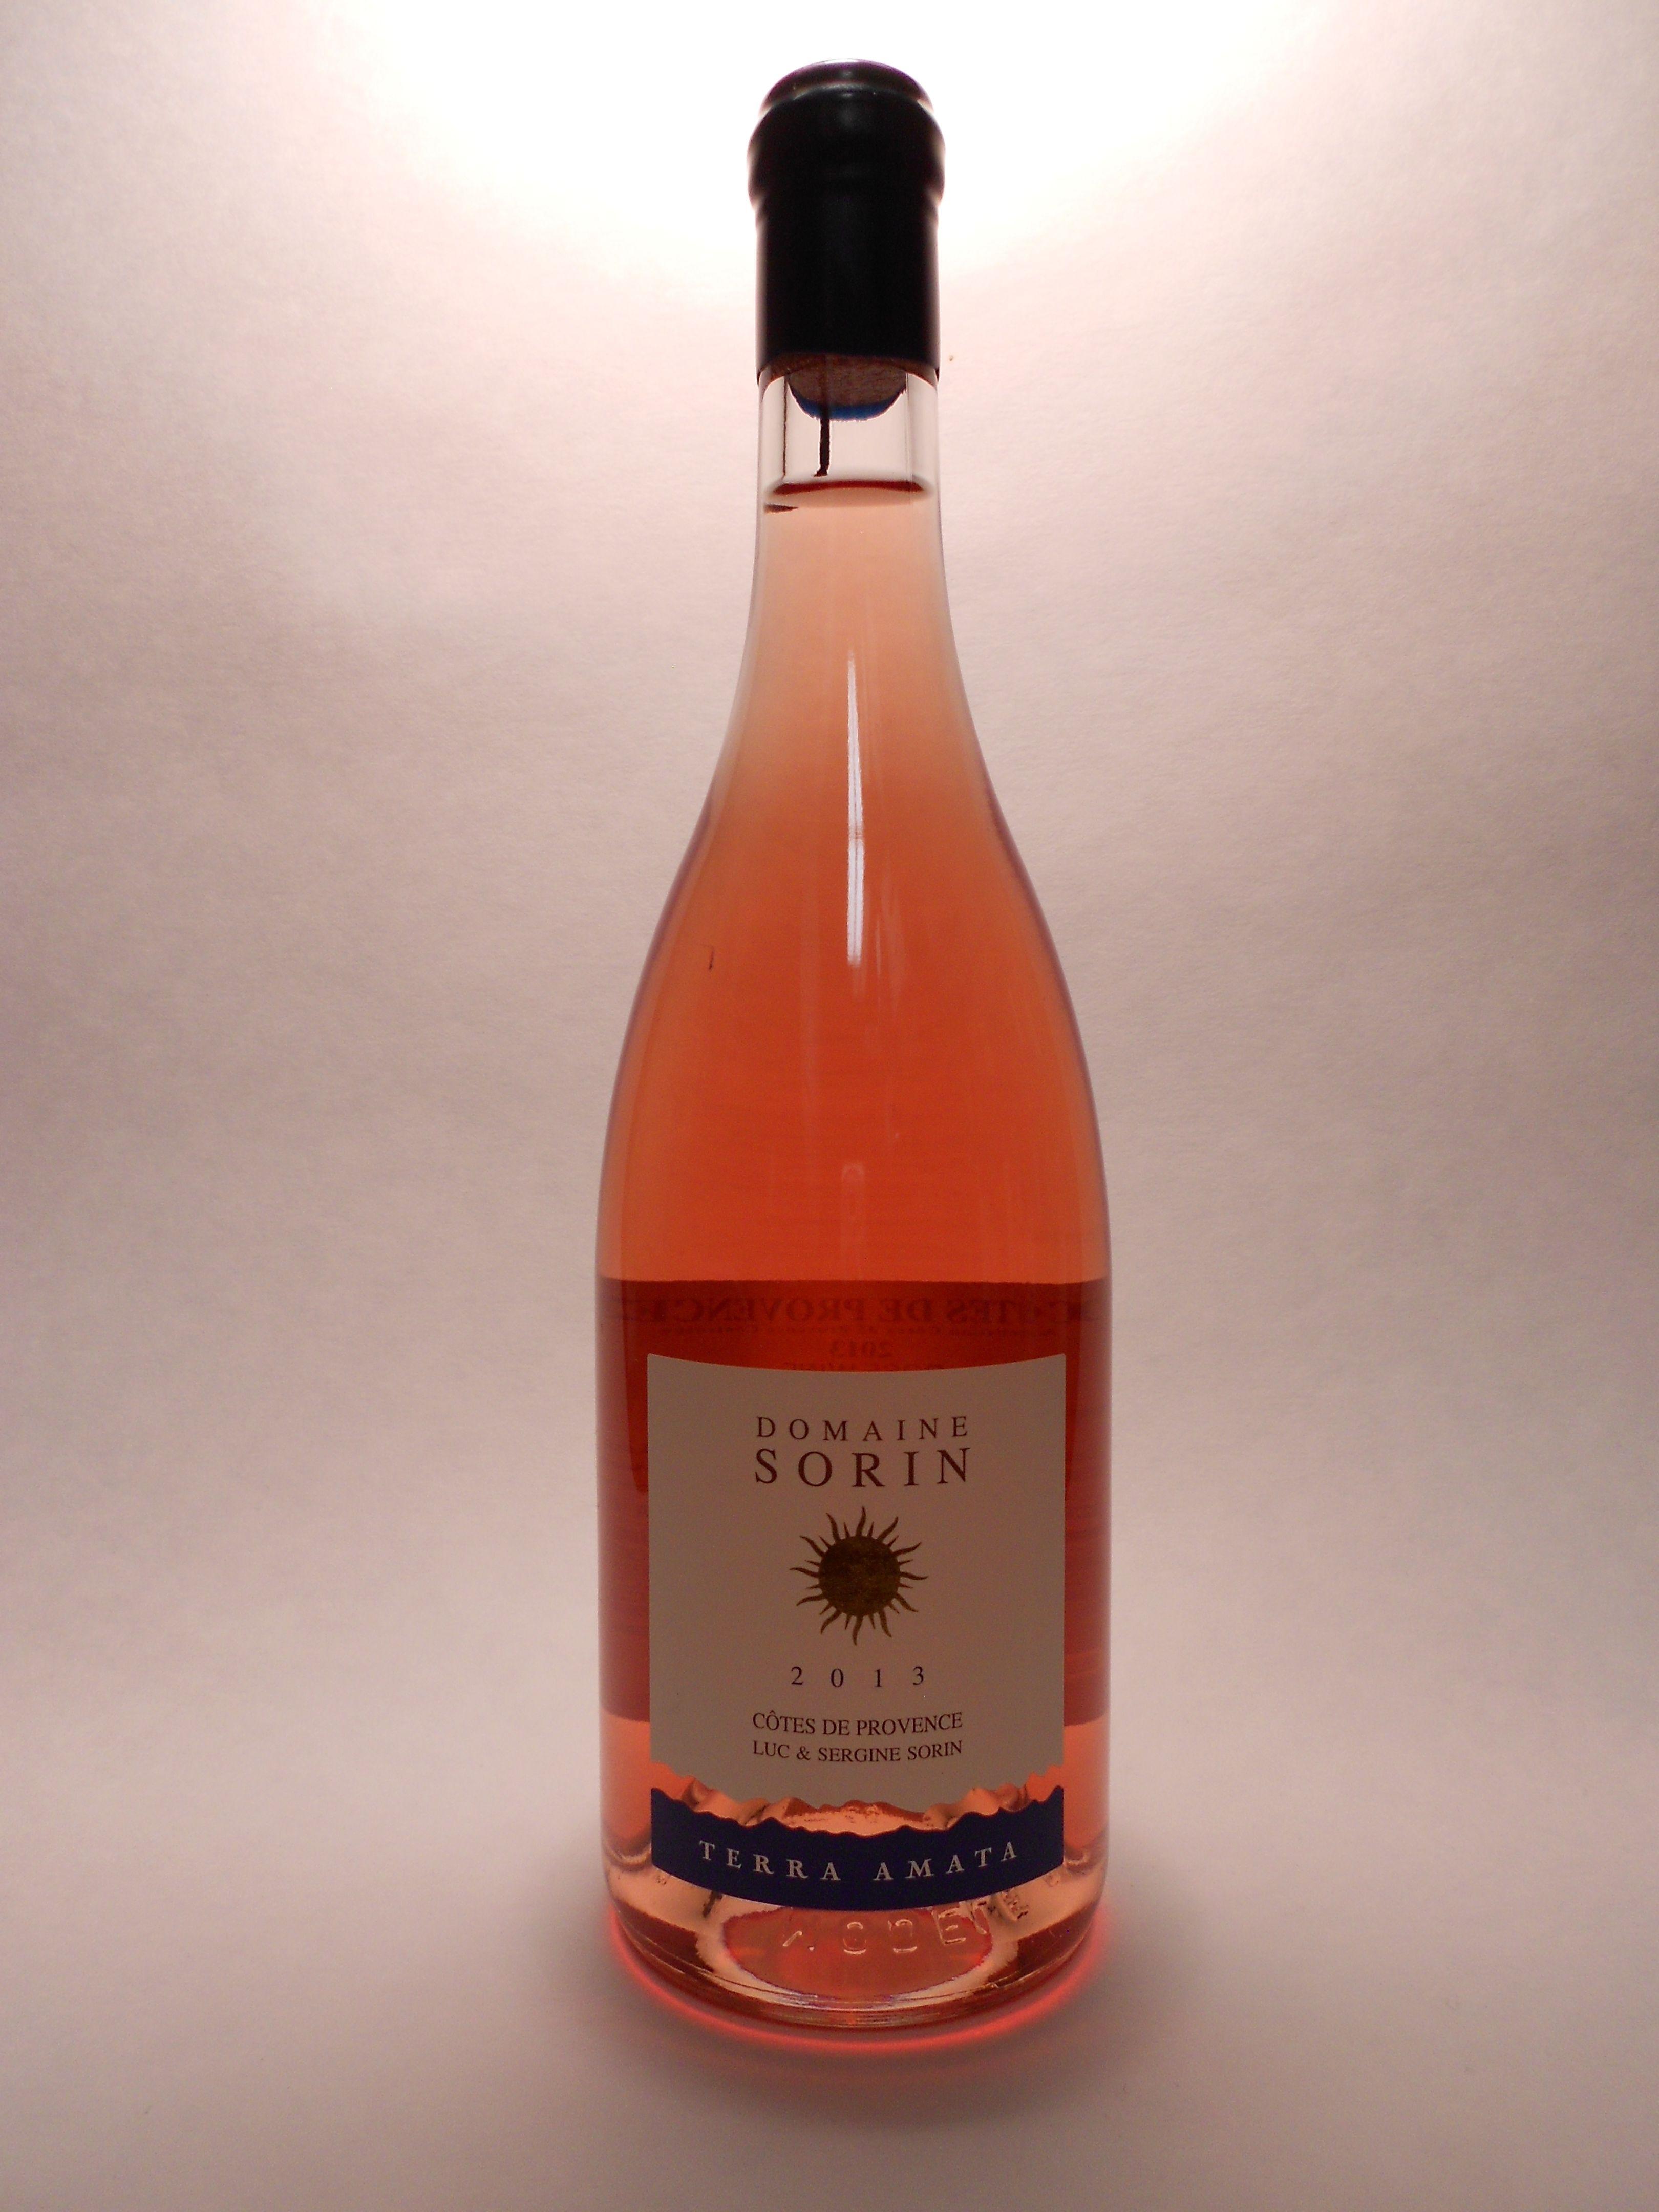 2013 Domaine Sorin Cotes Provence Rose Terra Amata Sku 61351 Www Bassins Com Phone 202 338 1433 Vino Rosado Vinos